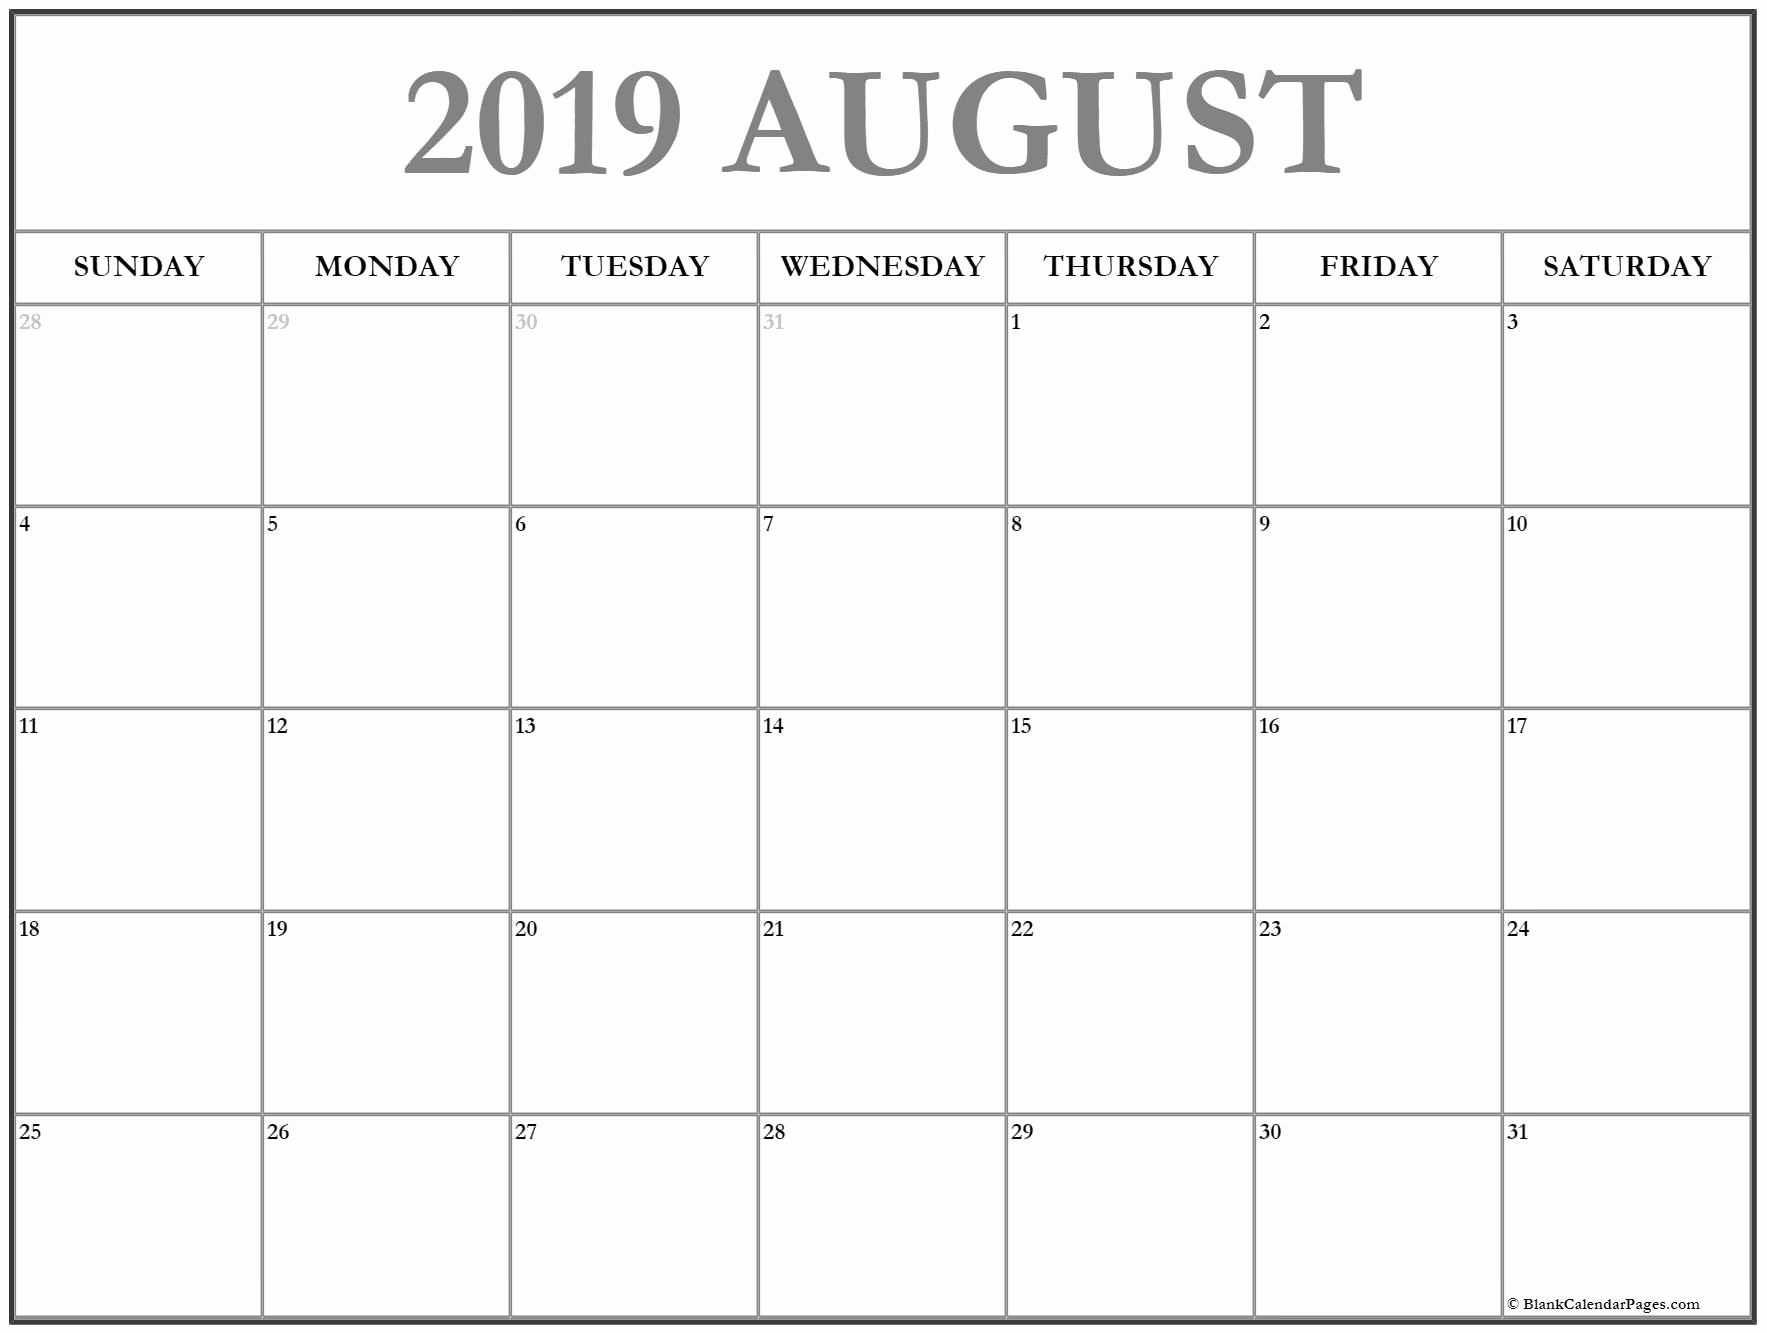 August 2019 Blank Calendar Monday Through Friday | Calendar Format throughout August Blank Calendar Monday Through Friday